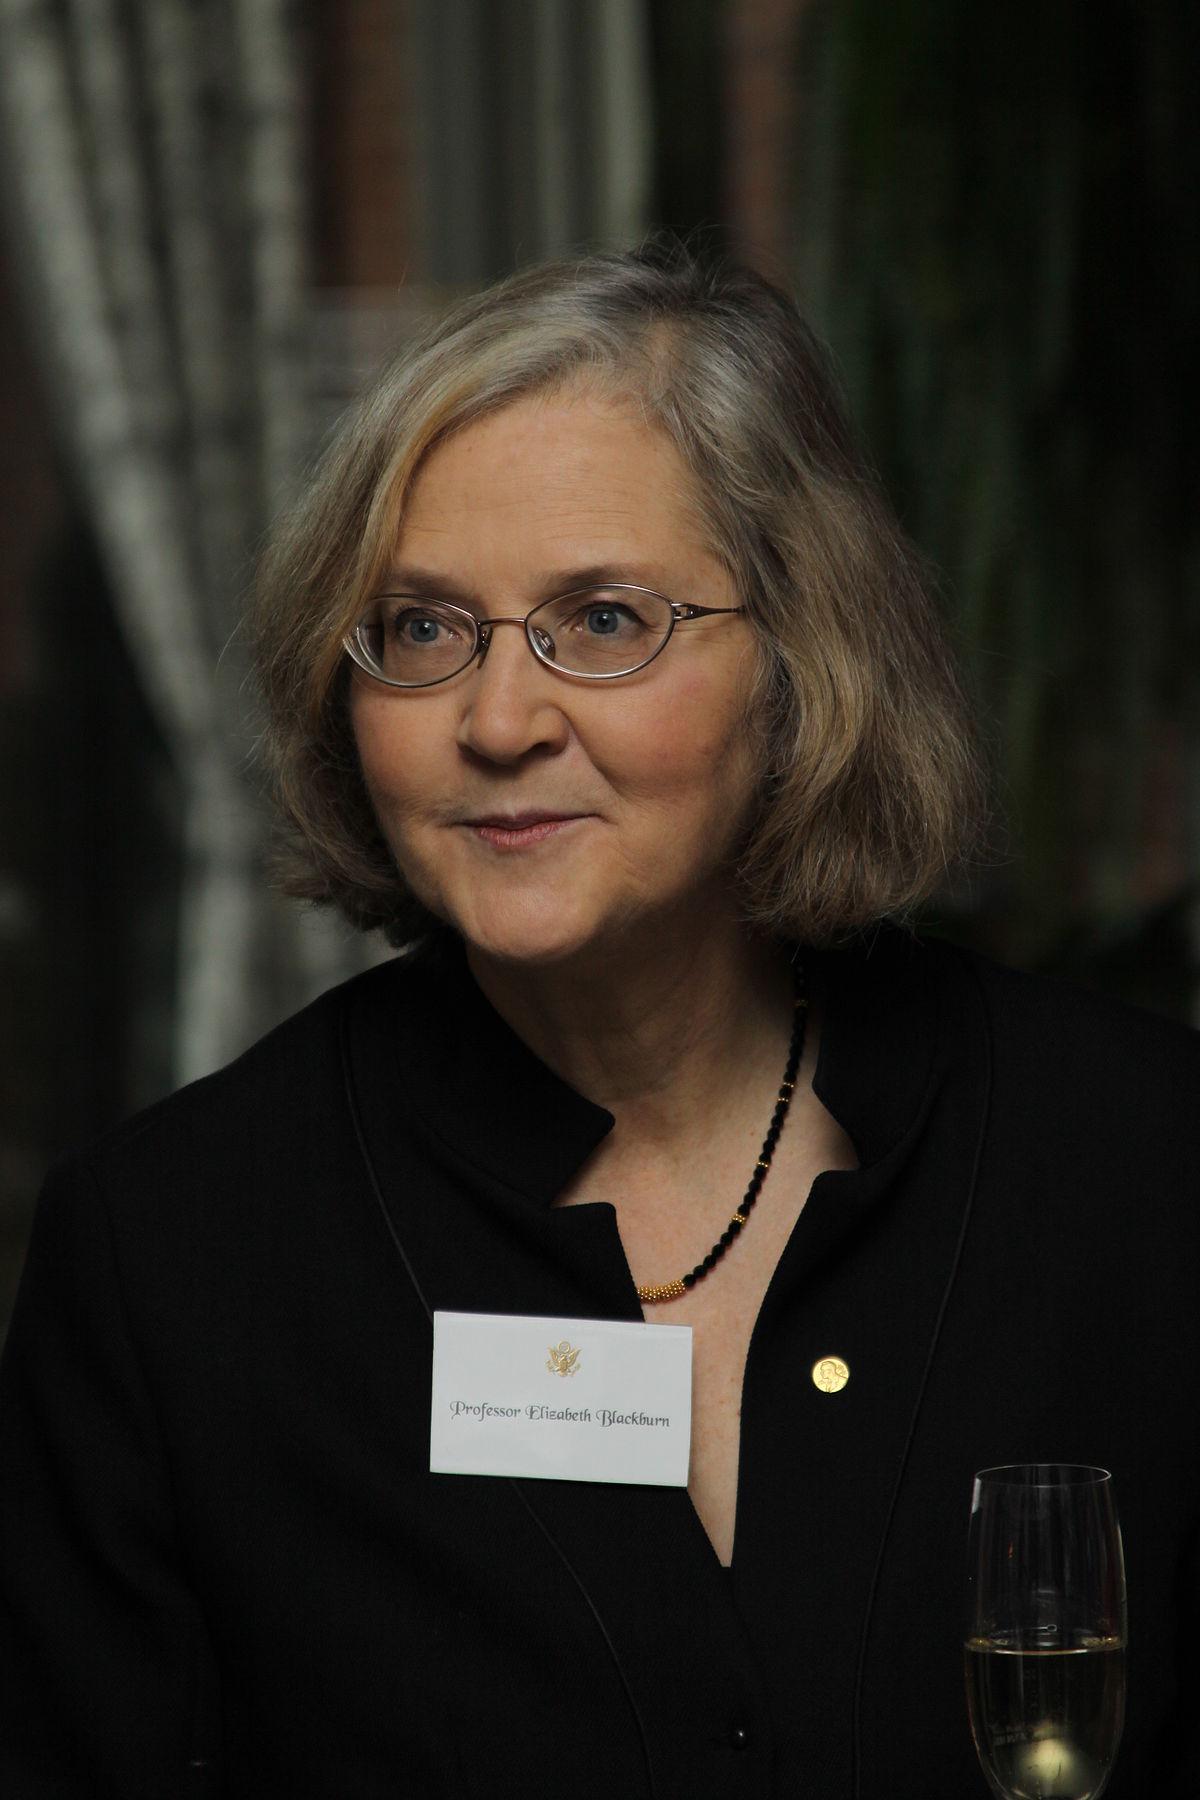 Elizabeth Blackburn - First female president of the Salk Institute, Nobel prize winner in biology